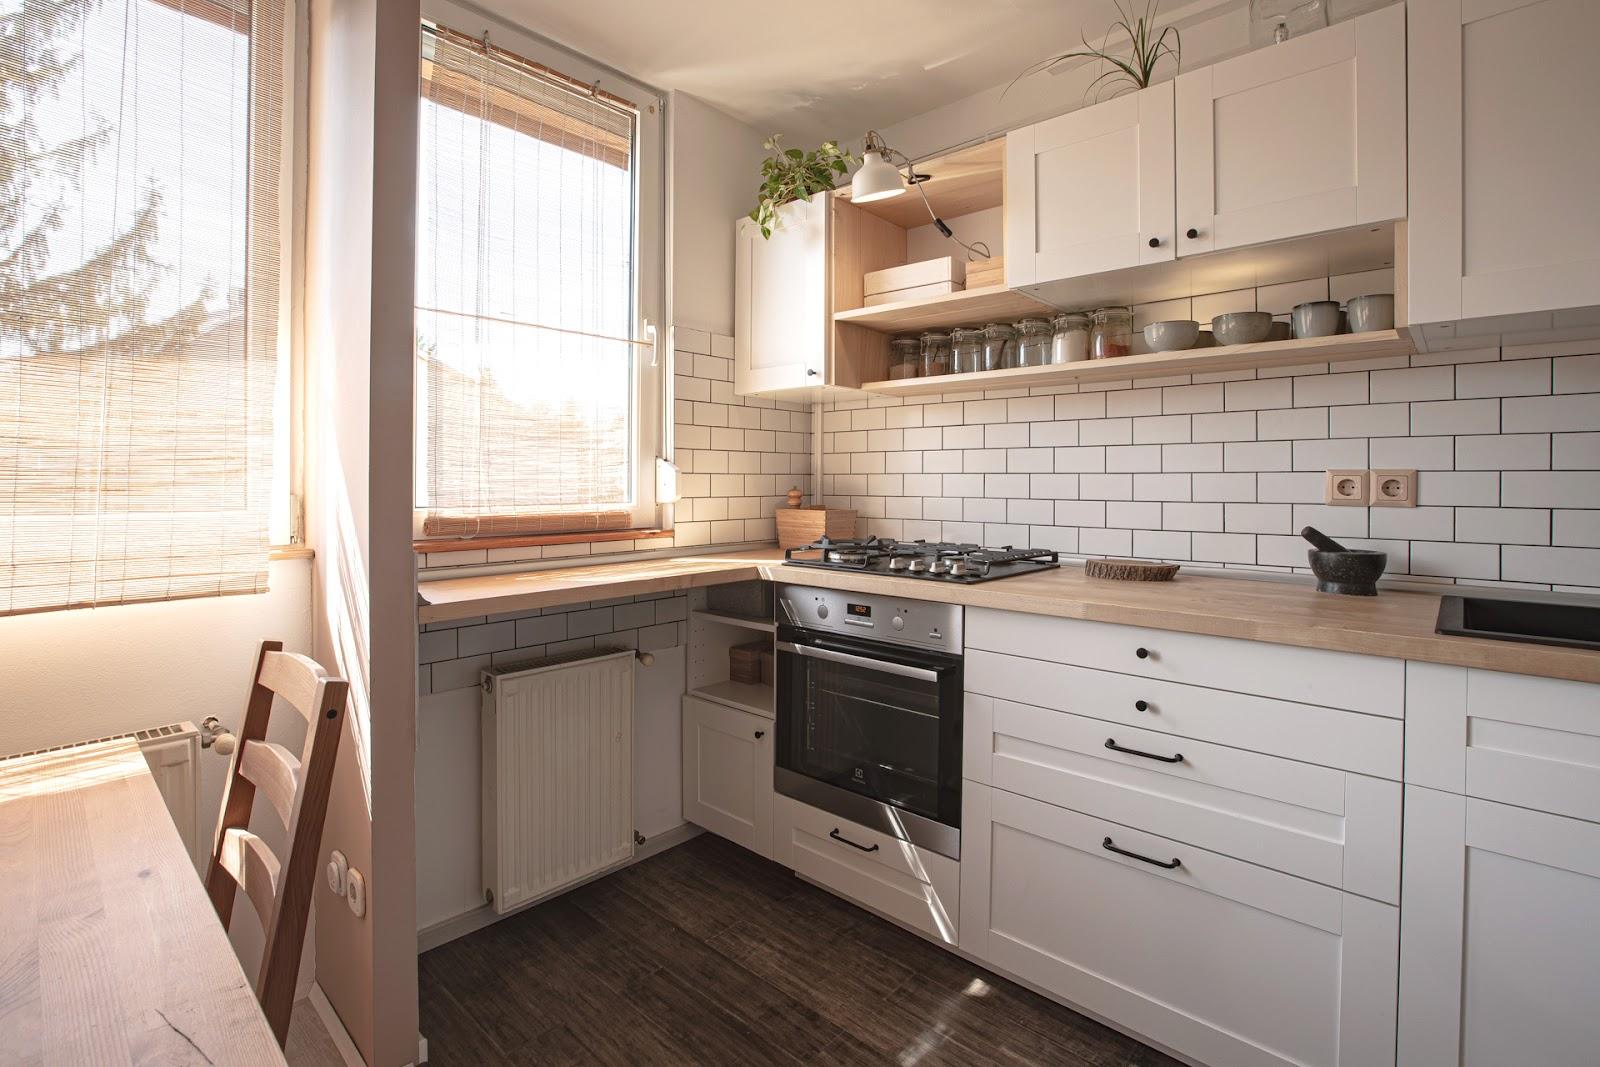 fehér konyhabútor fa munkalappal